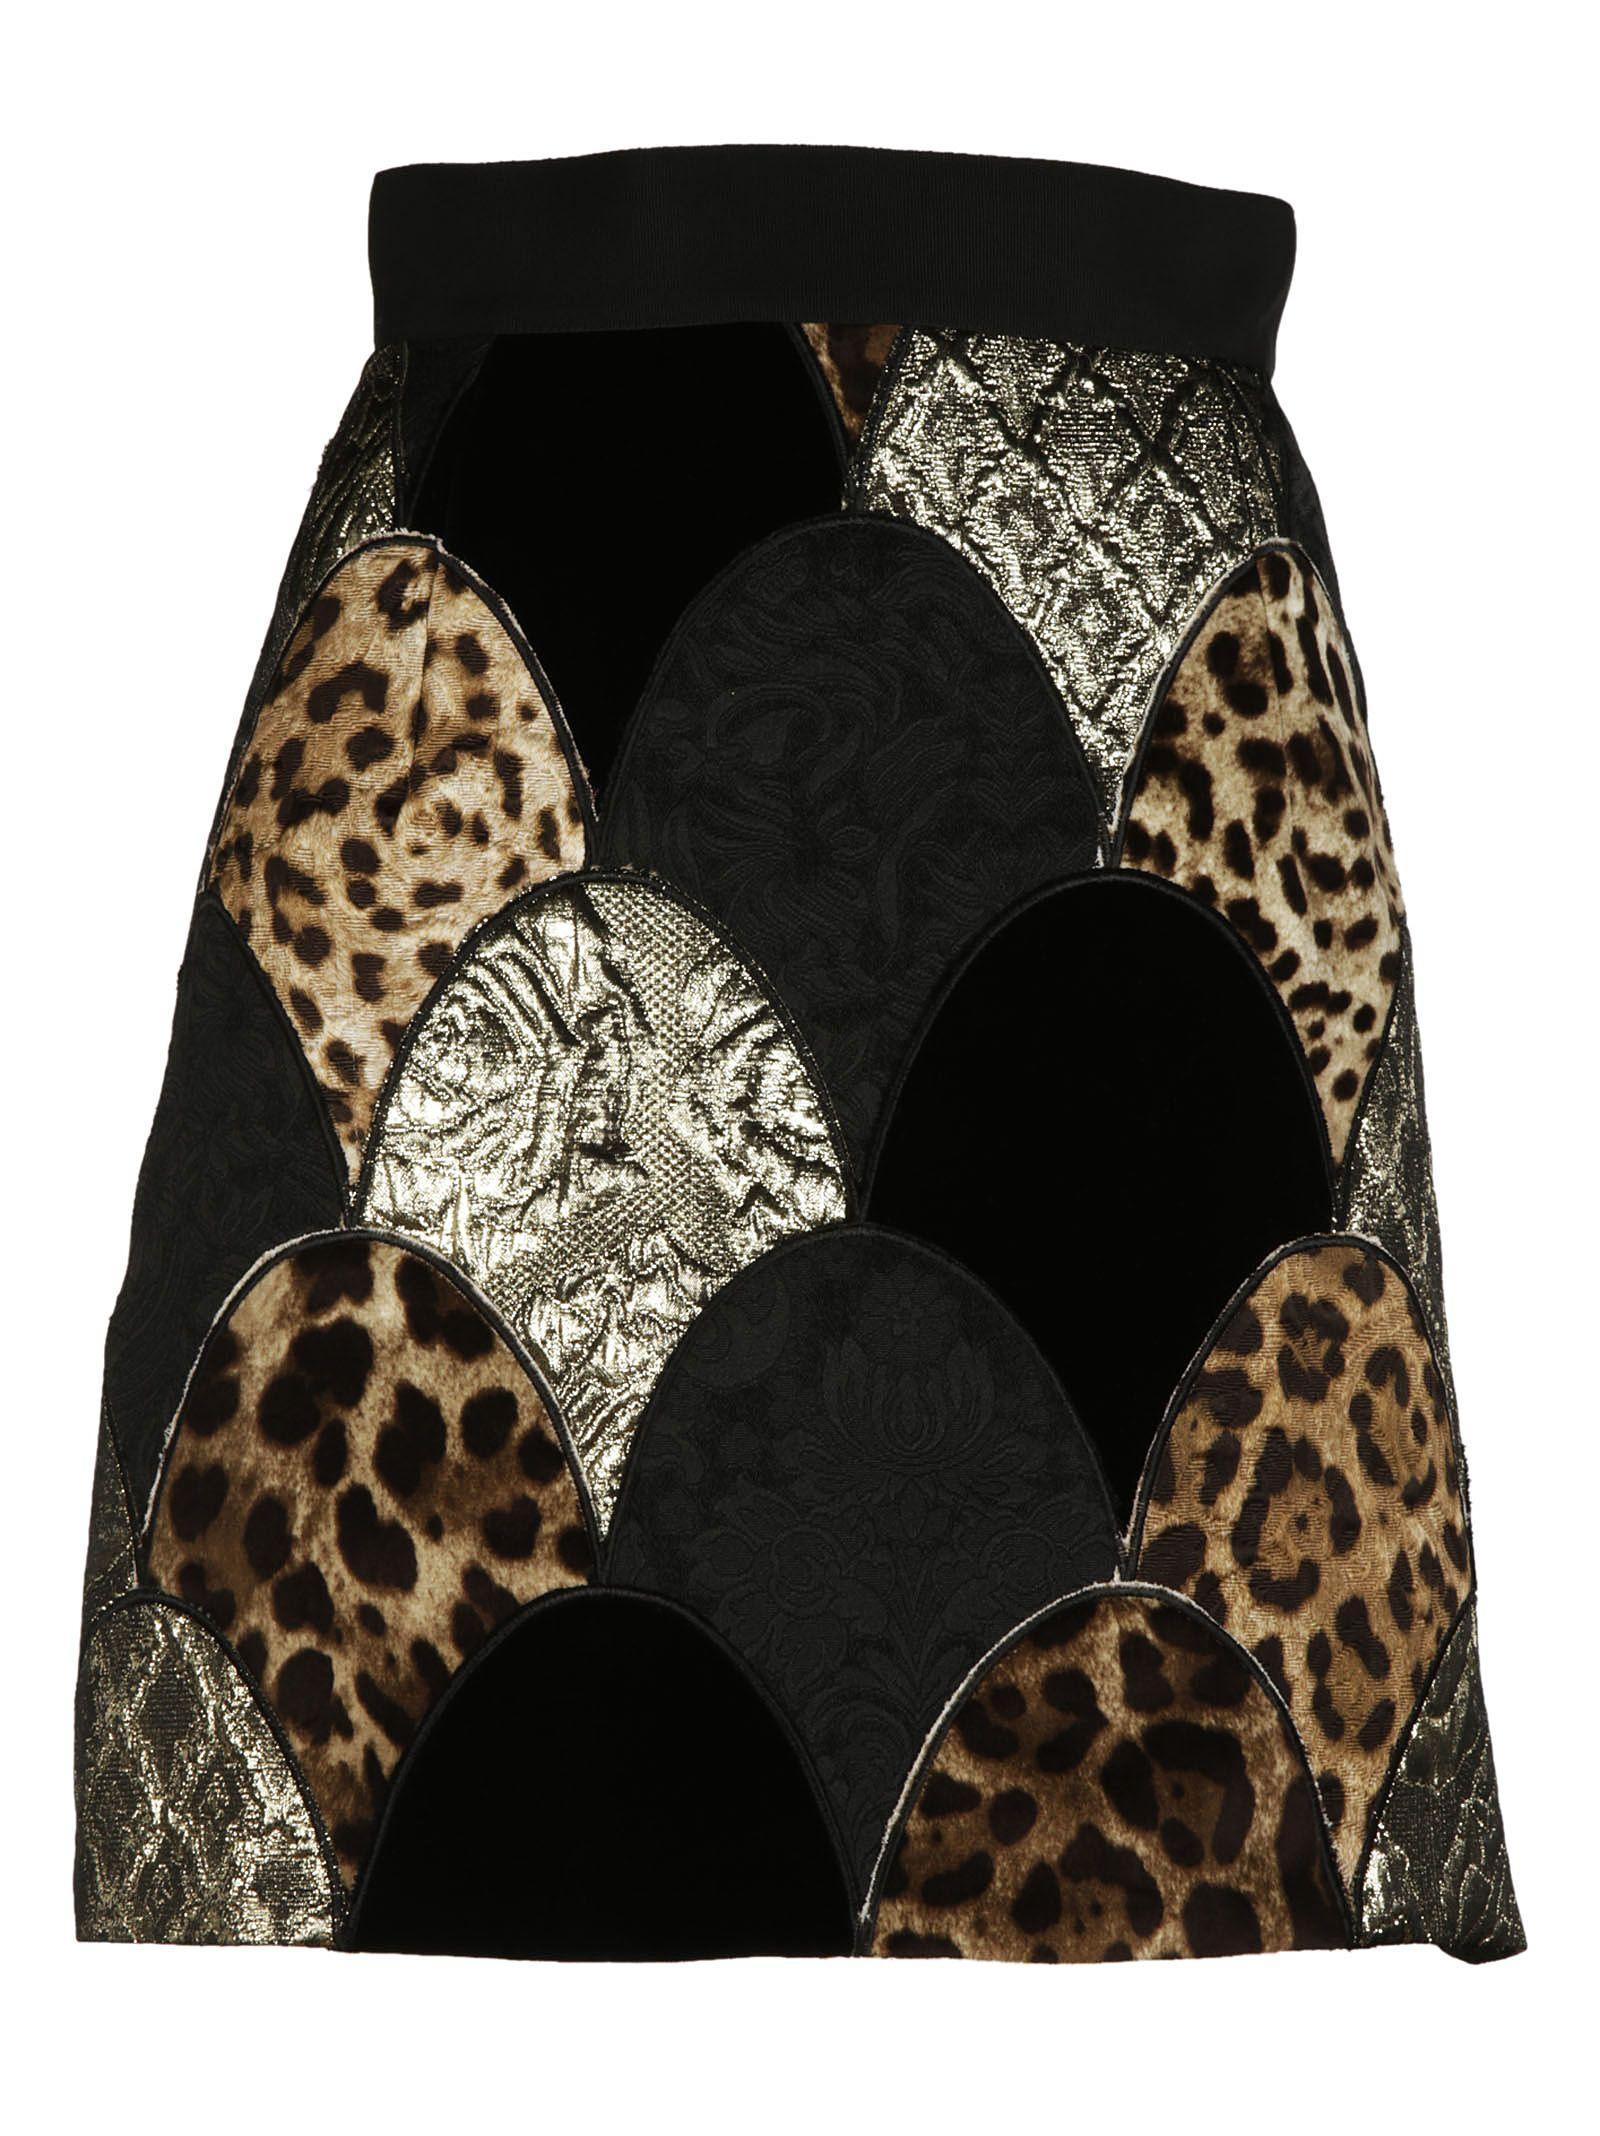 Dolce & Gabbana Jacquard Detail Skirt In Multicolor